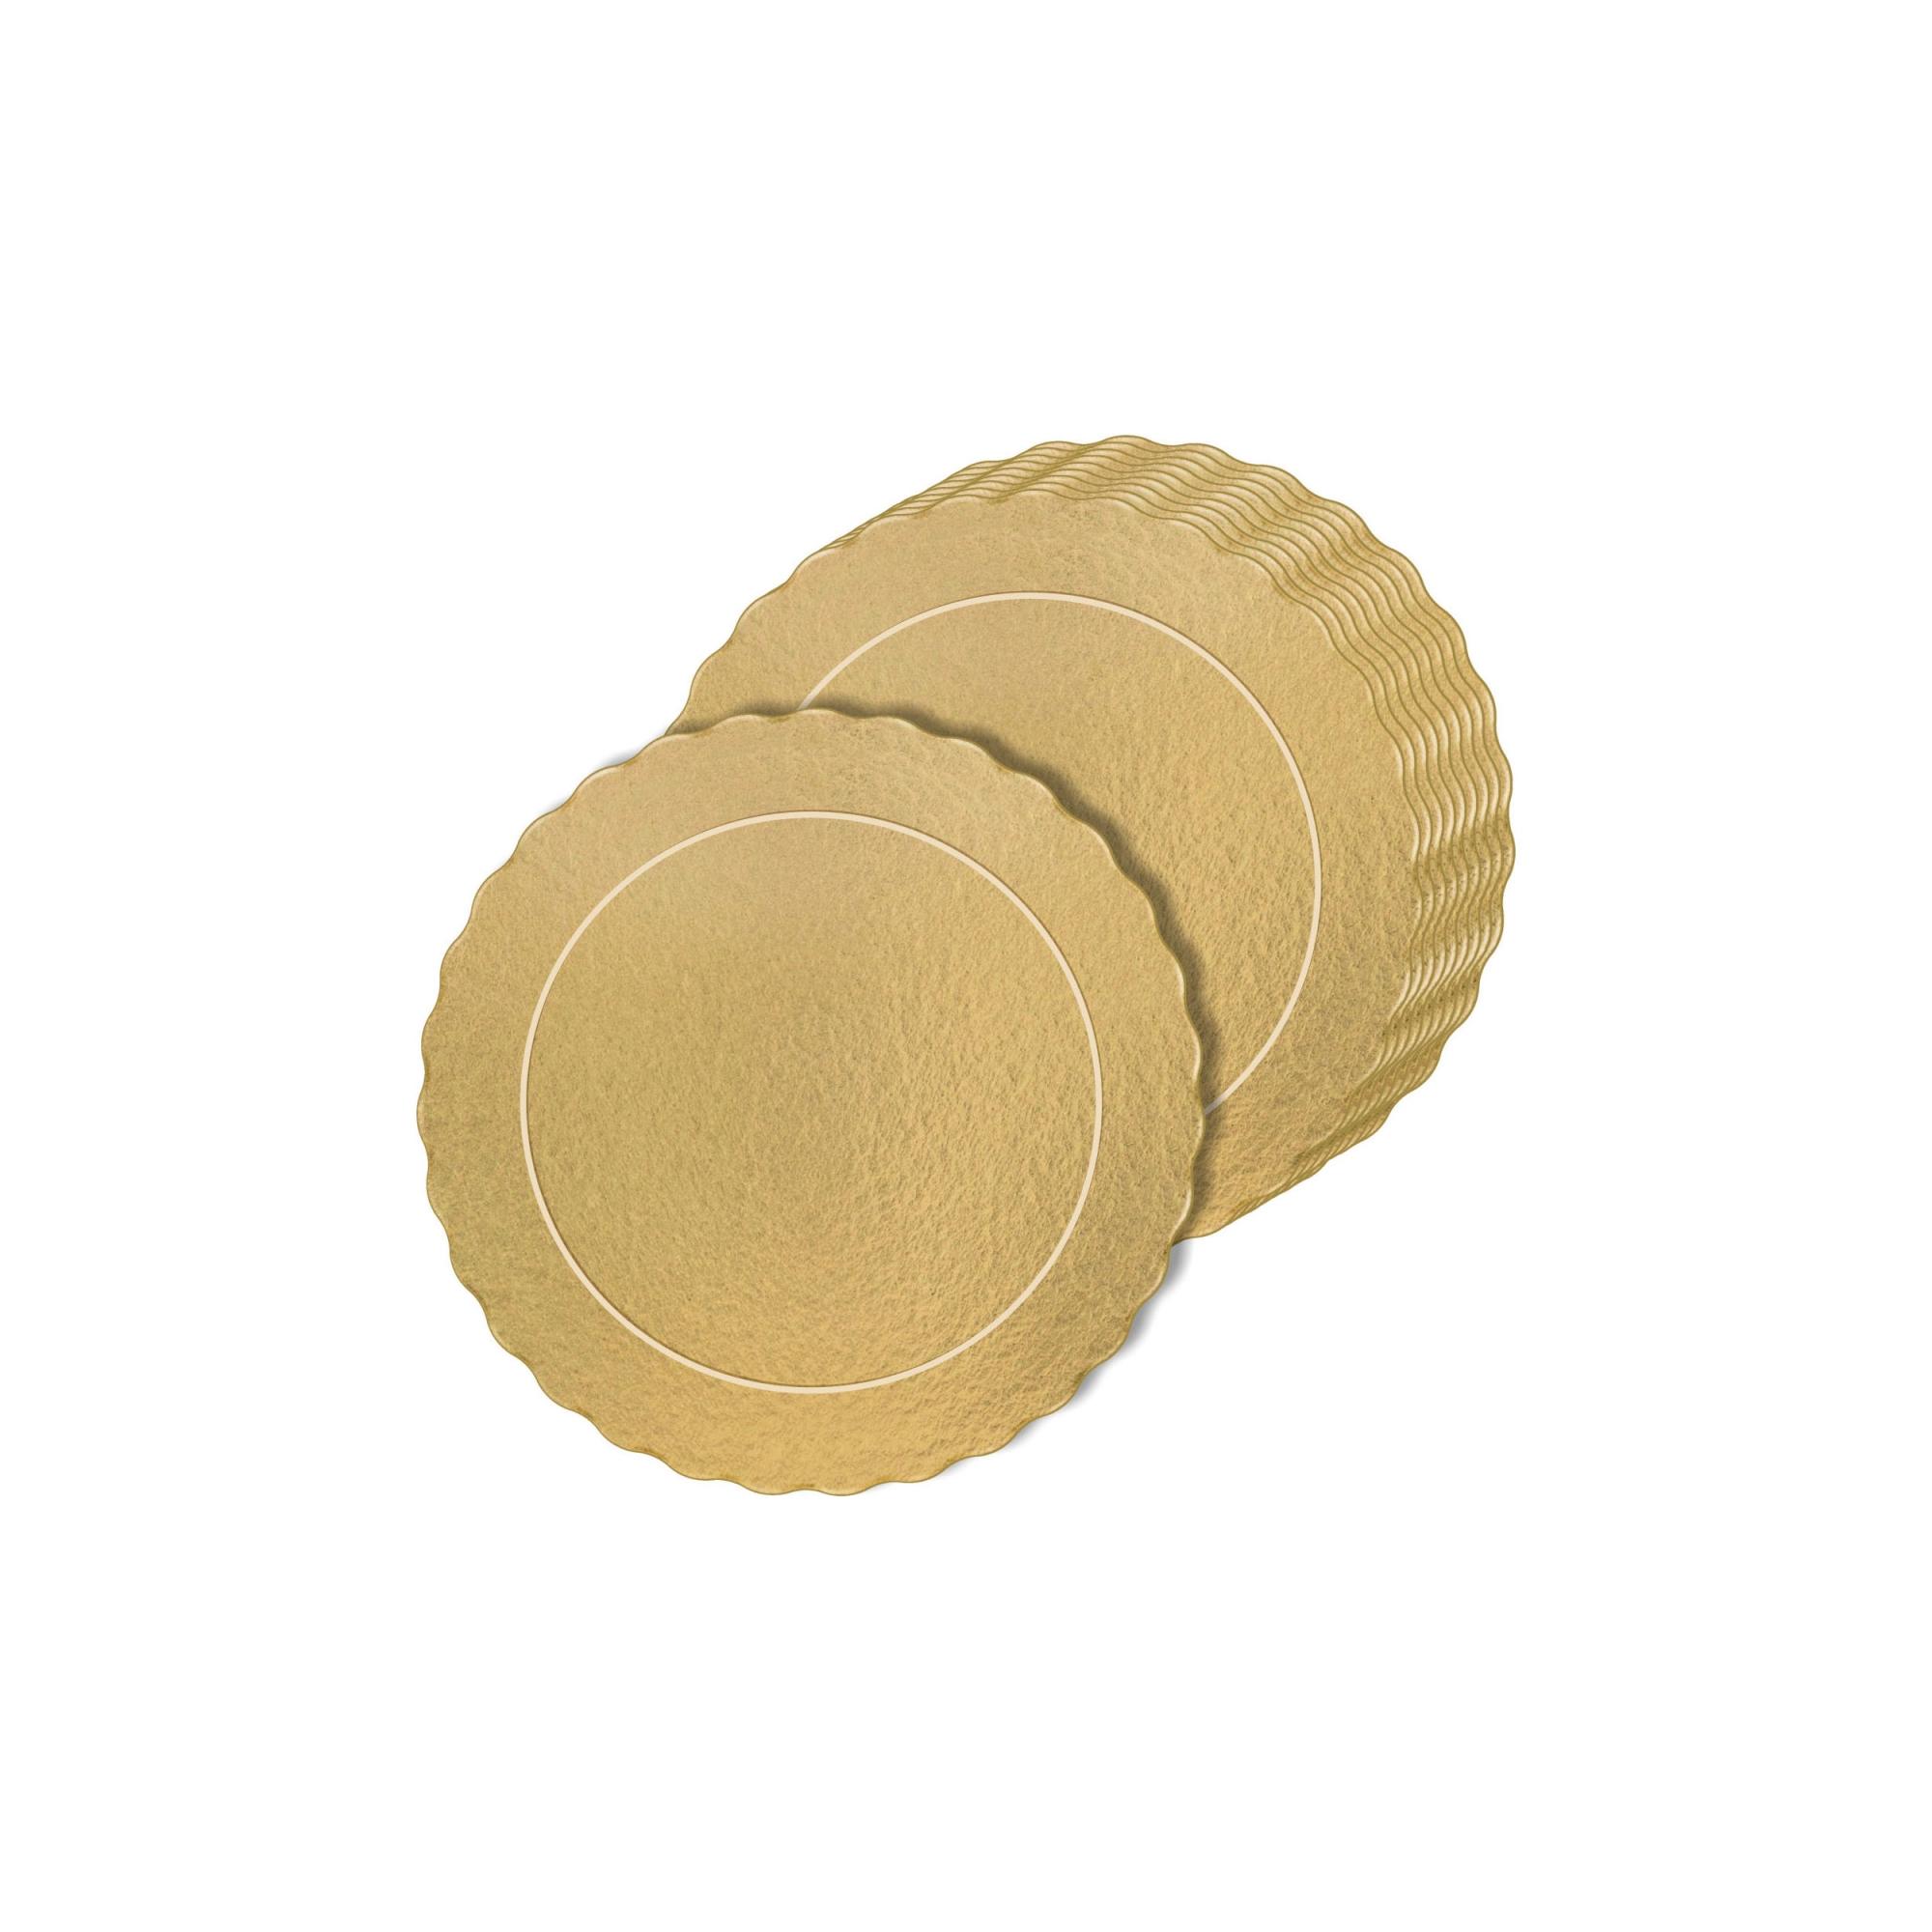 100 Bases Laminadas, Suporte P/ Bolo, Cake Board, 15cm - Ouro